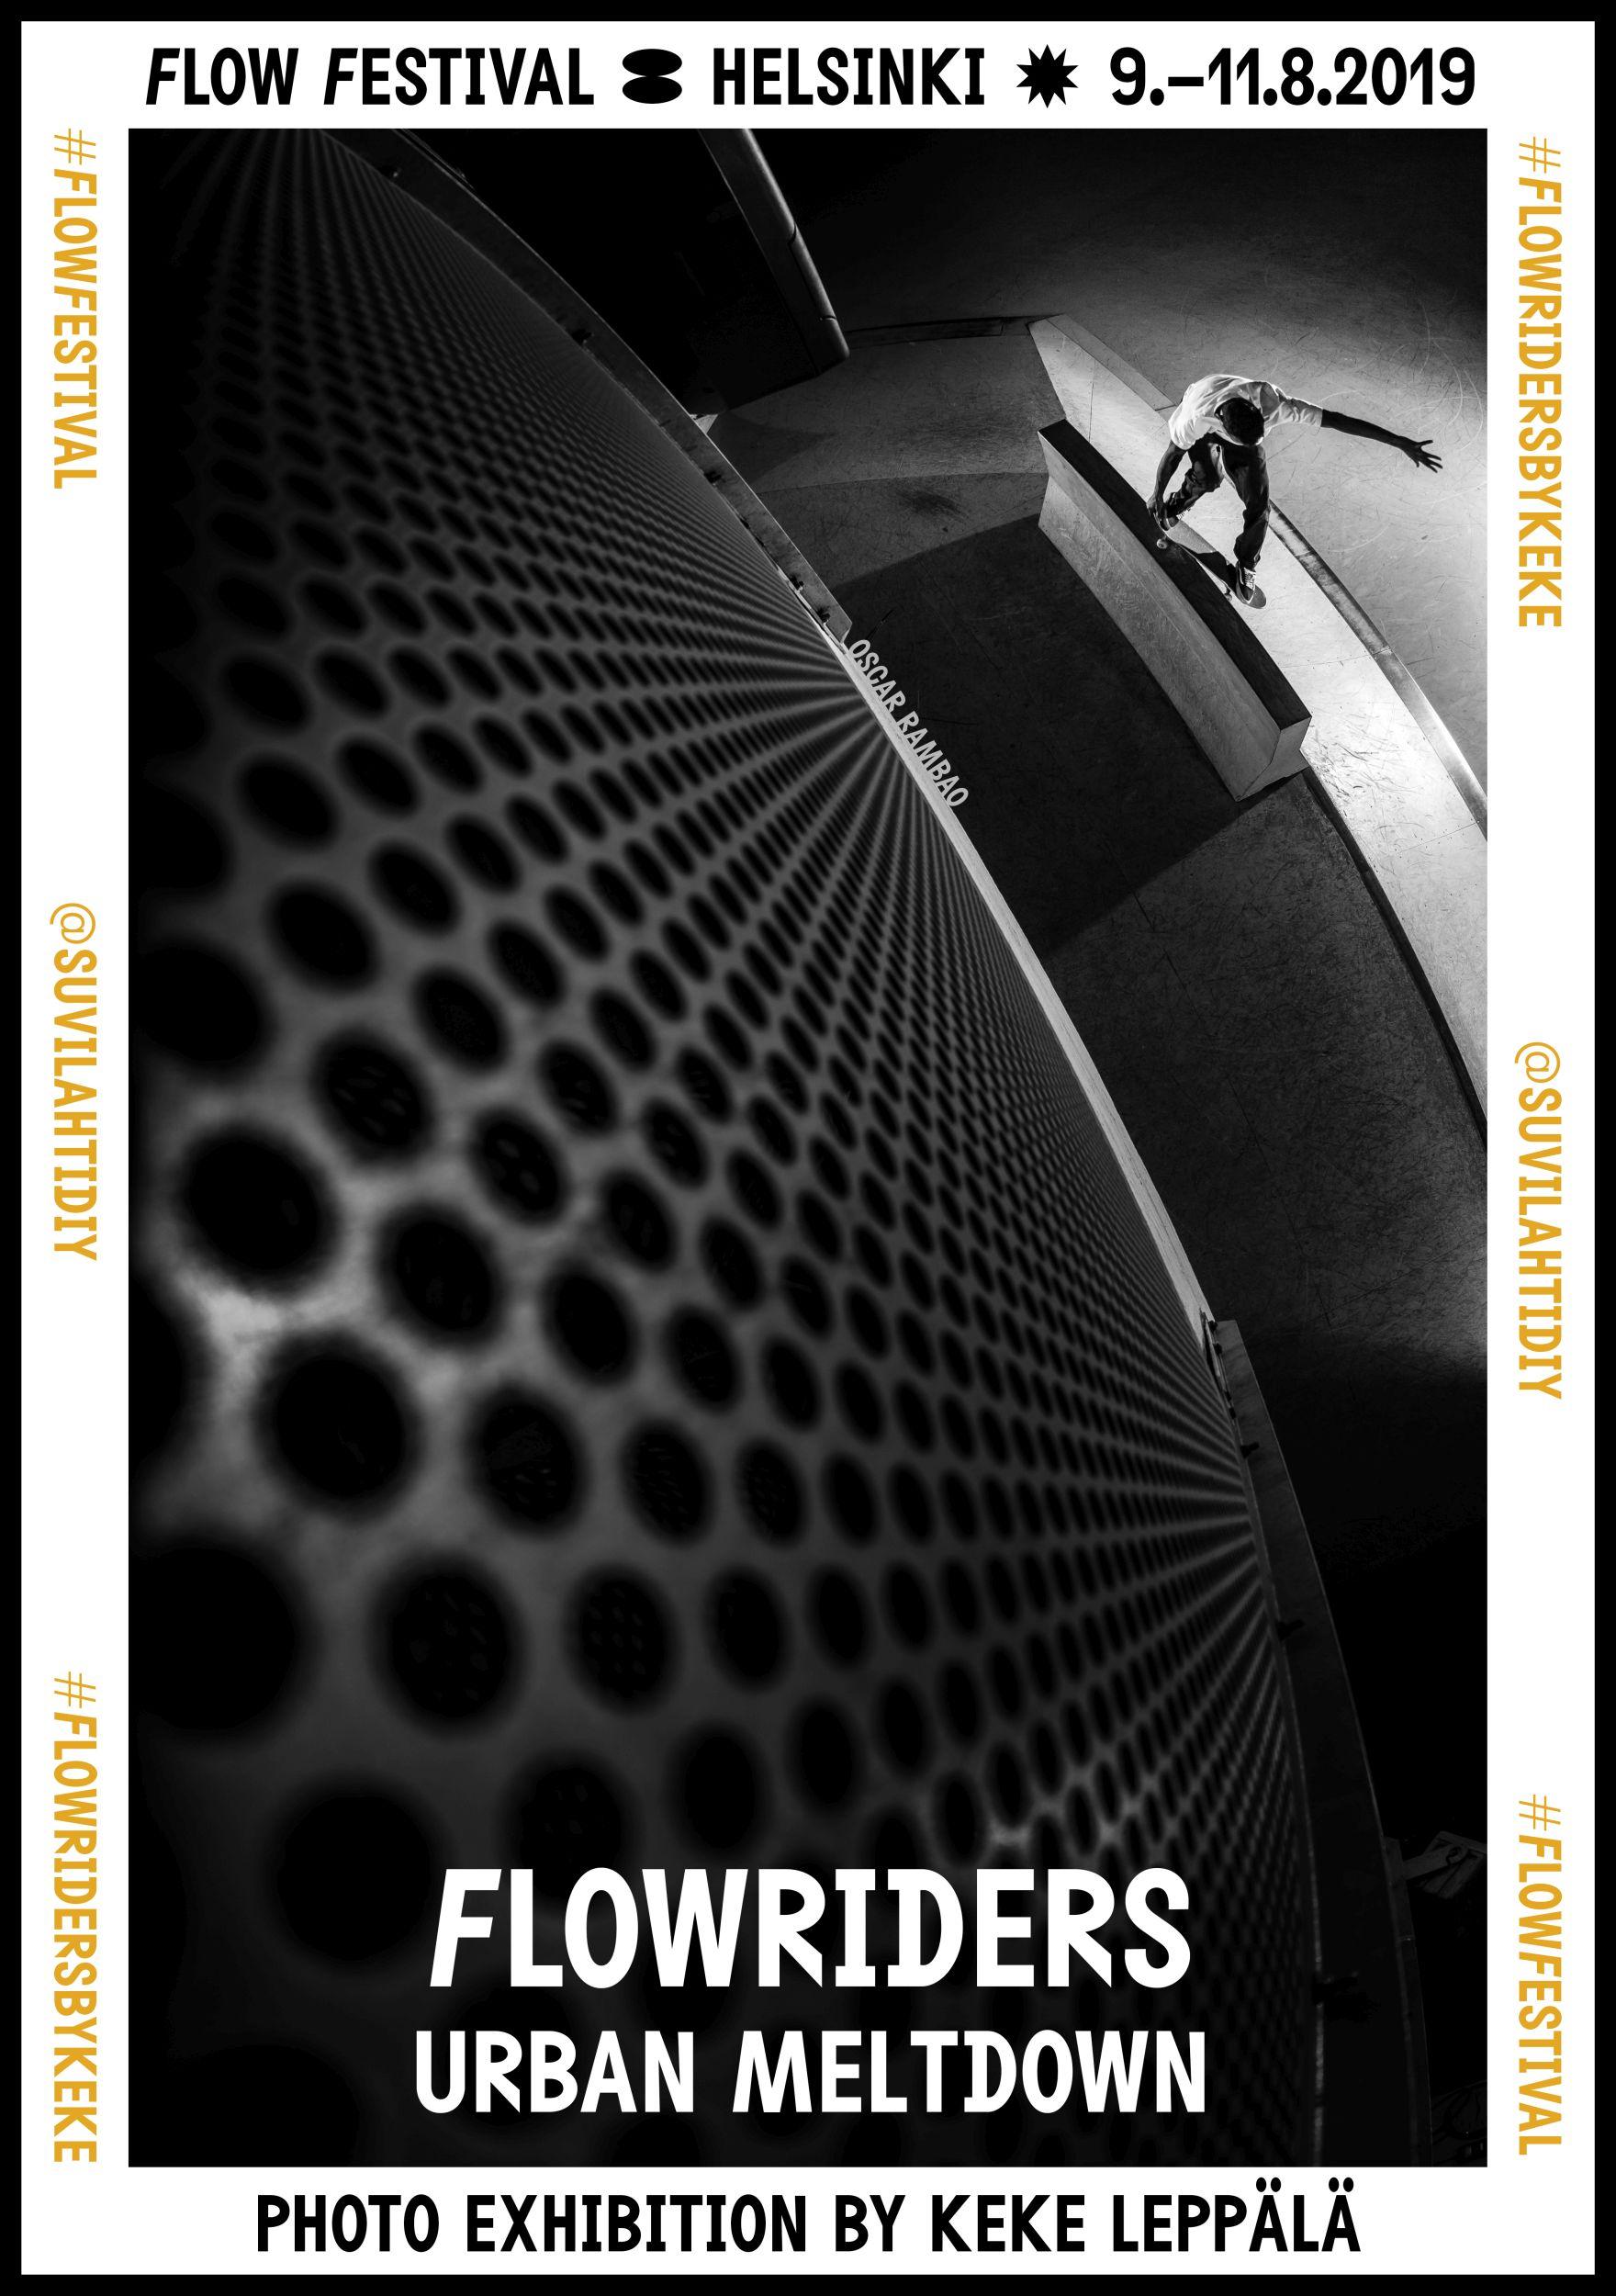 flowriders-urban meltdown flyer4 - Oscar Rambao - 2019 kekeleppala.jpg